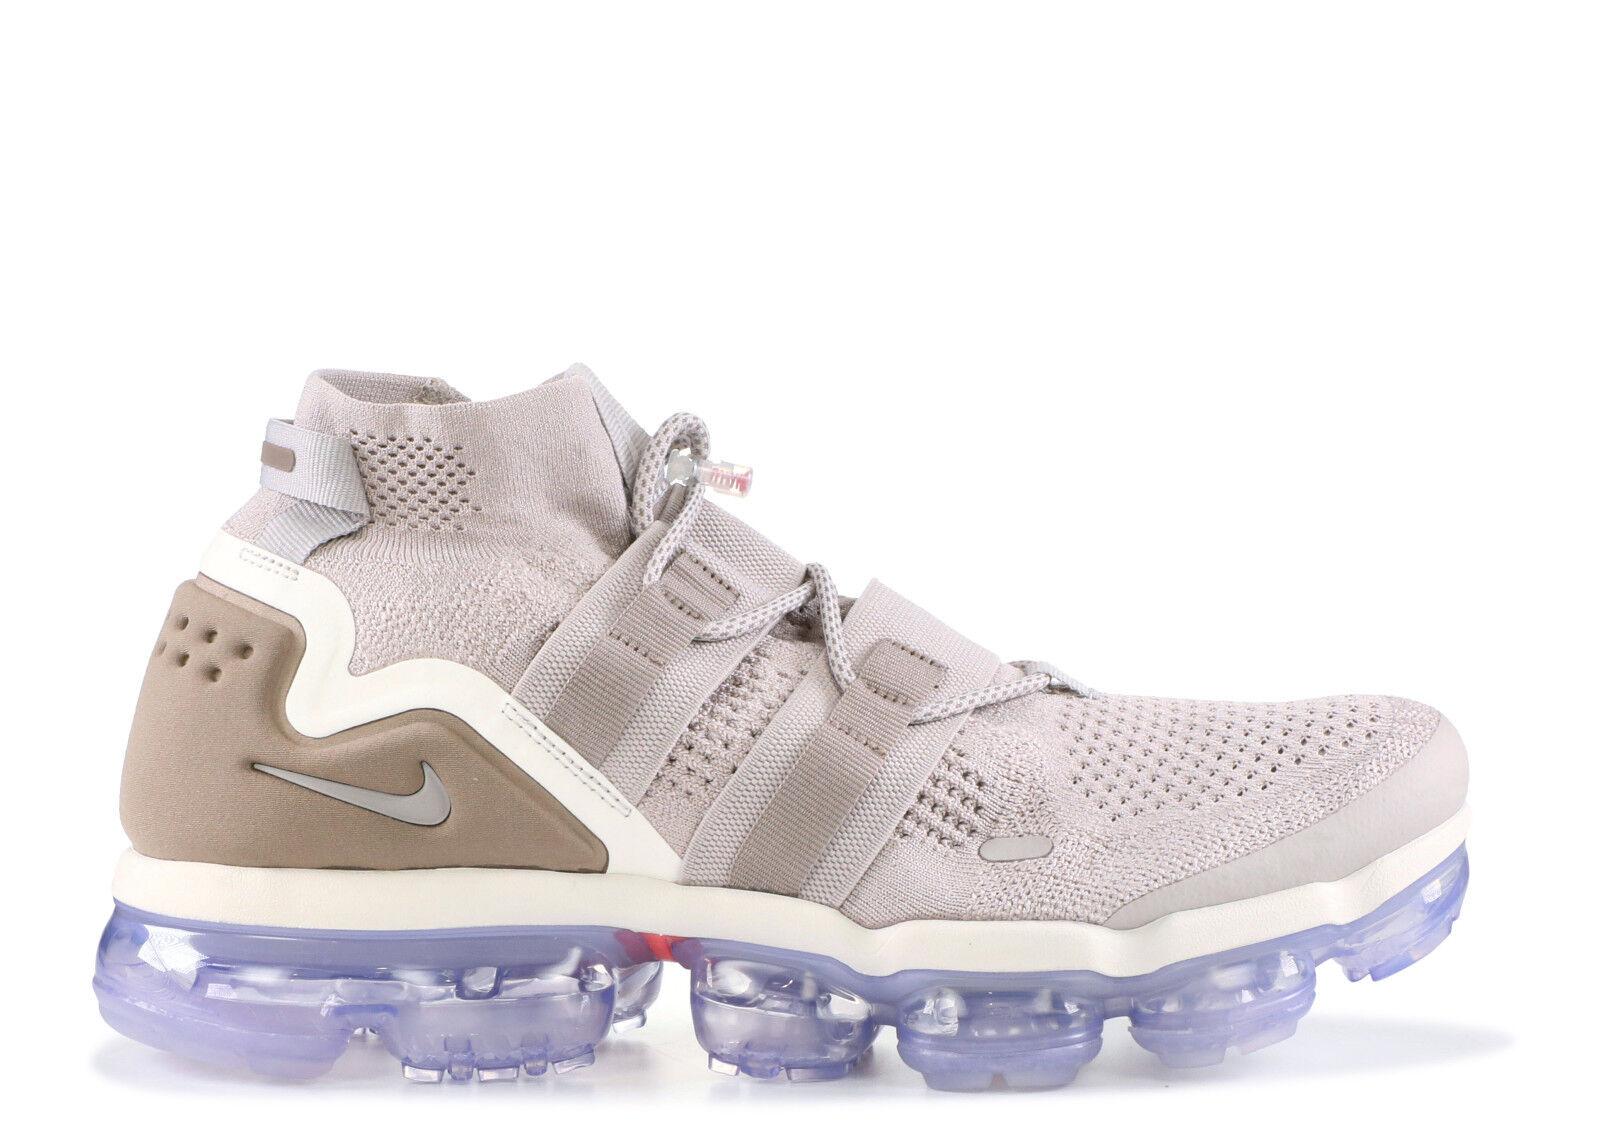 New hombres zapatos Trainers zapatillas NIKE AIR VAPORMAX FLYNIT AH6834-205